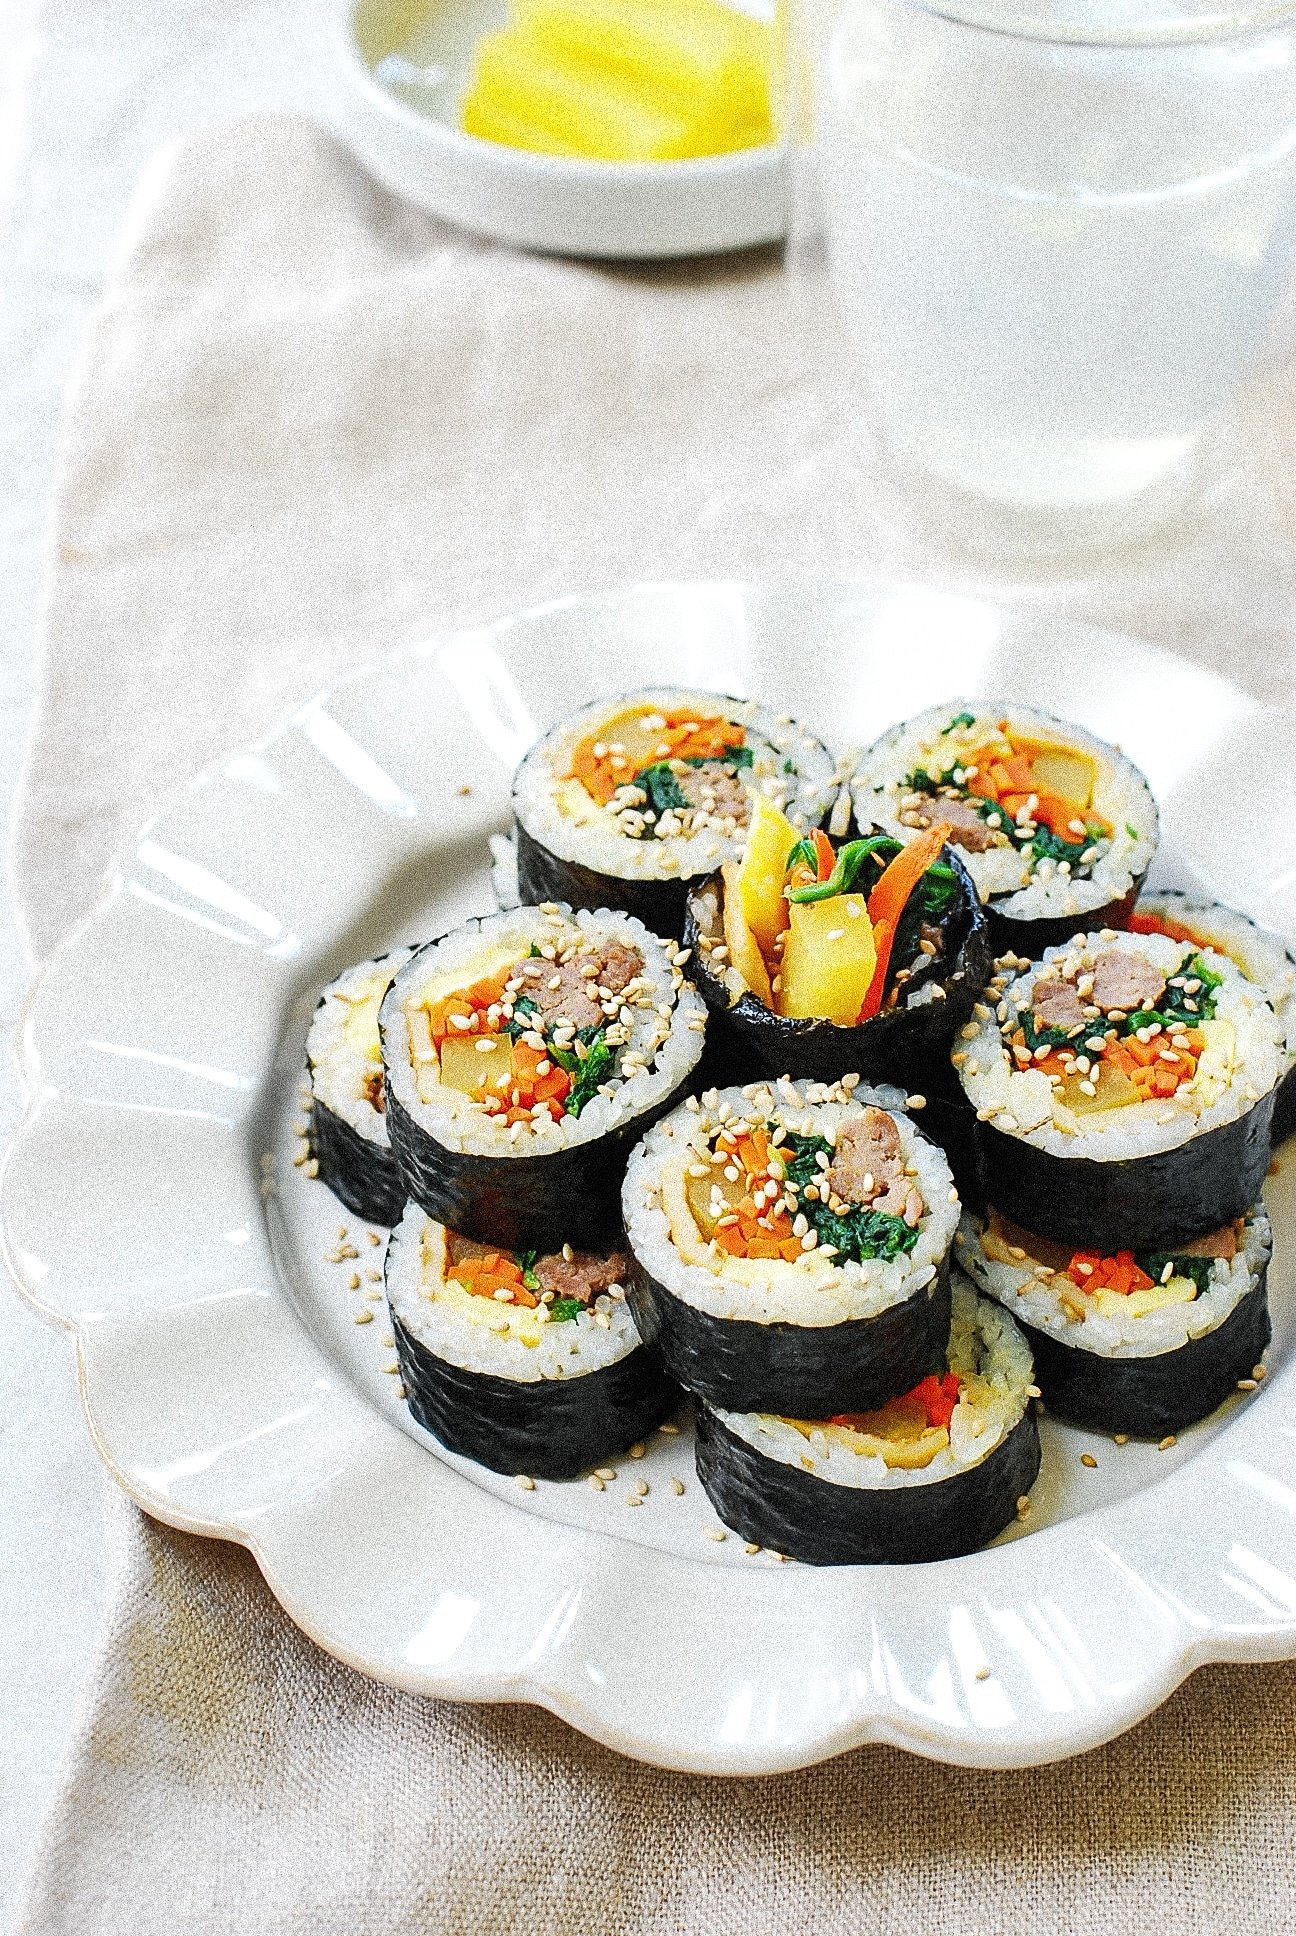 DSC 0427 - Gimbap (Korean Seaweed Rice Rolls)